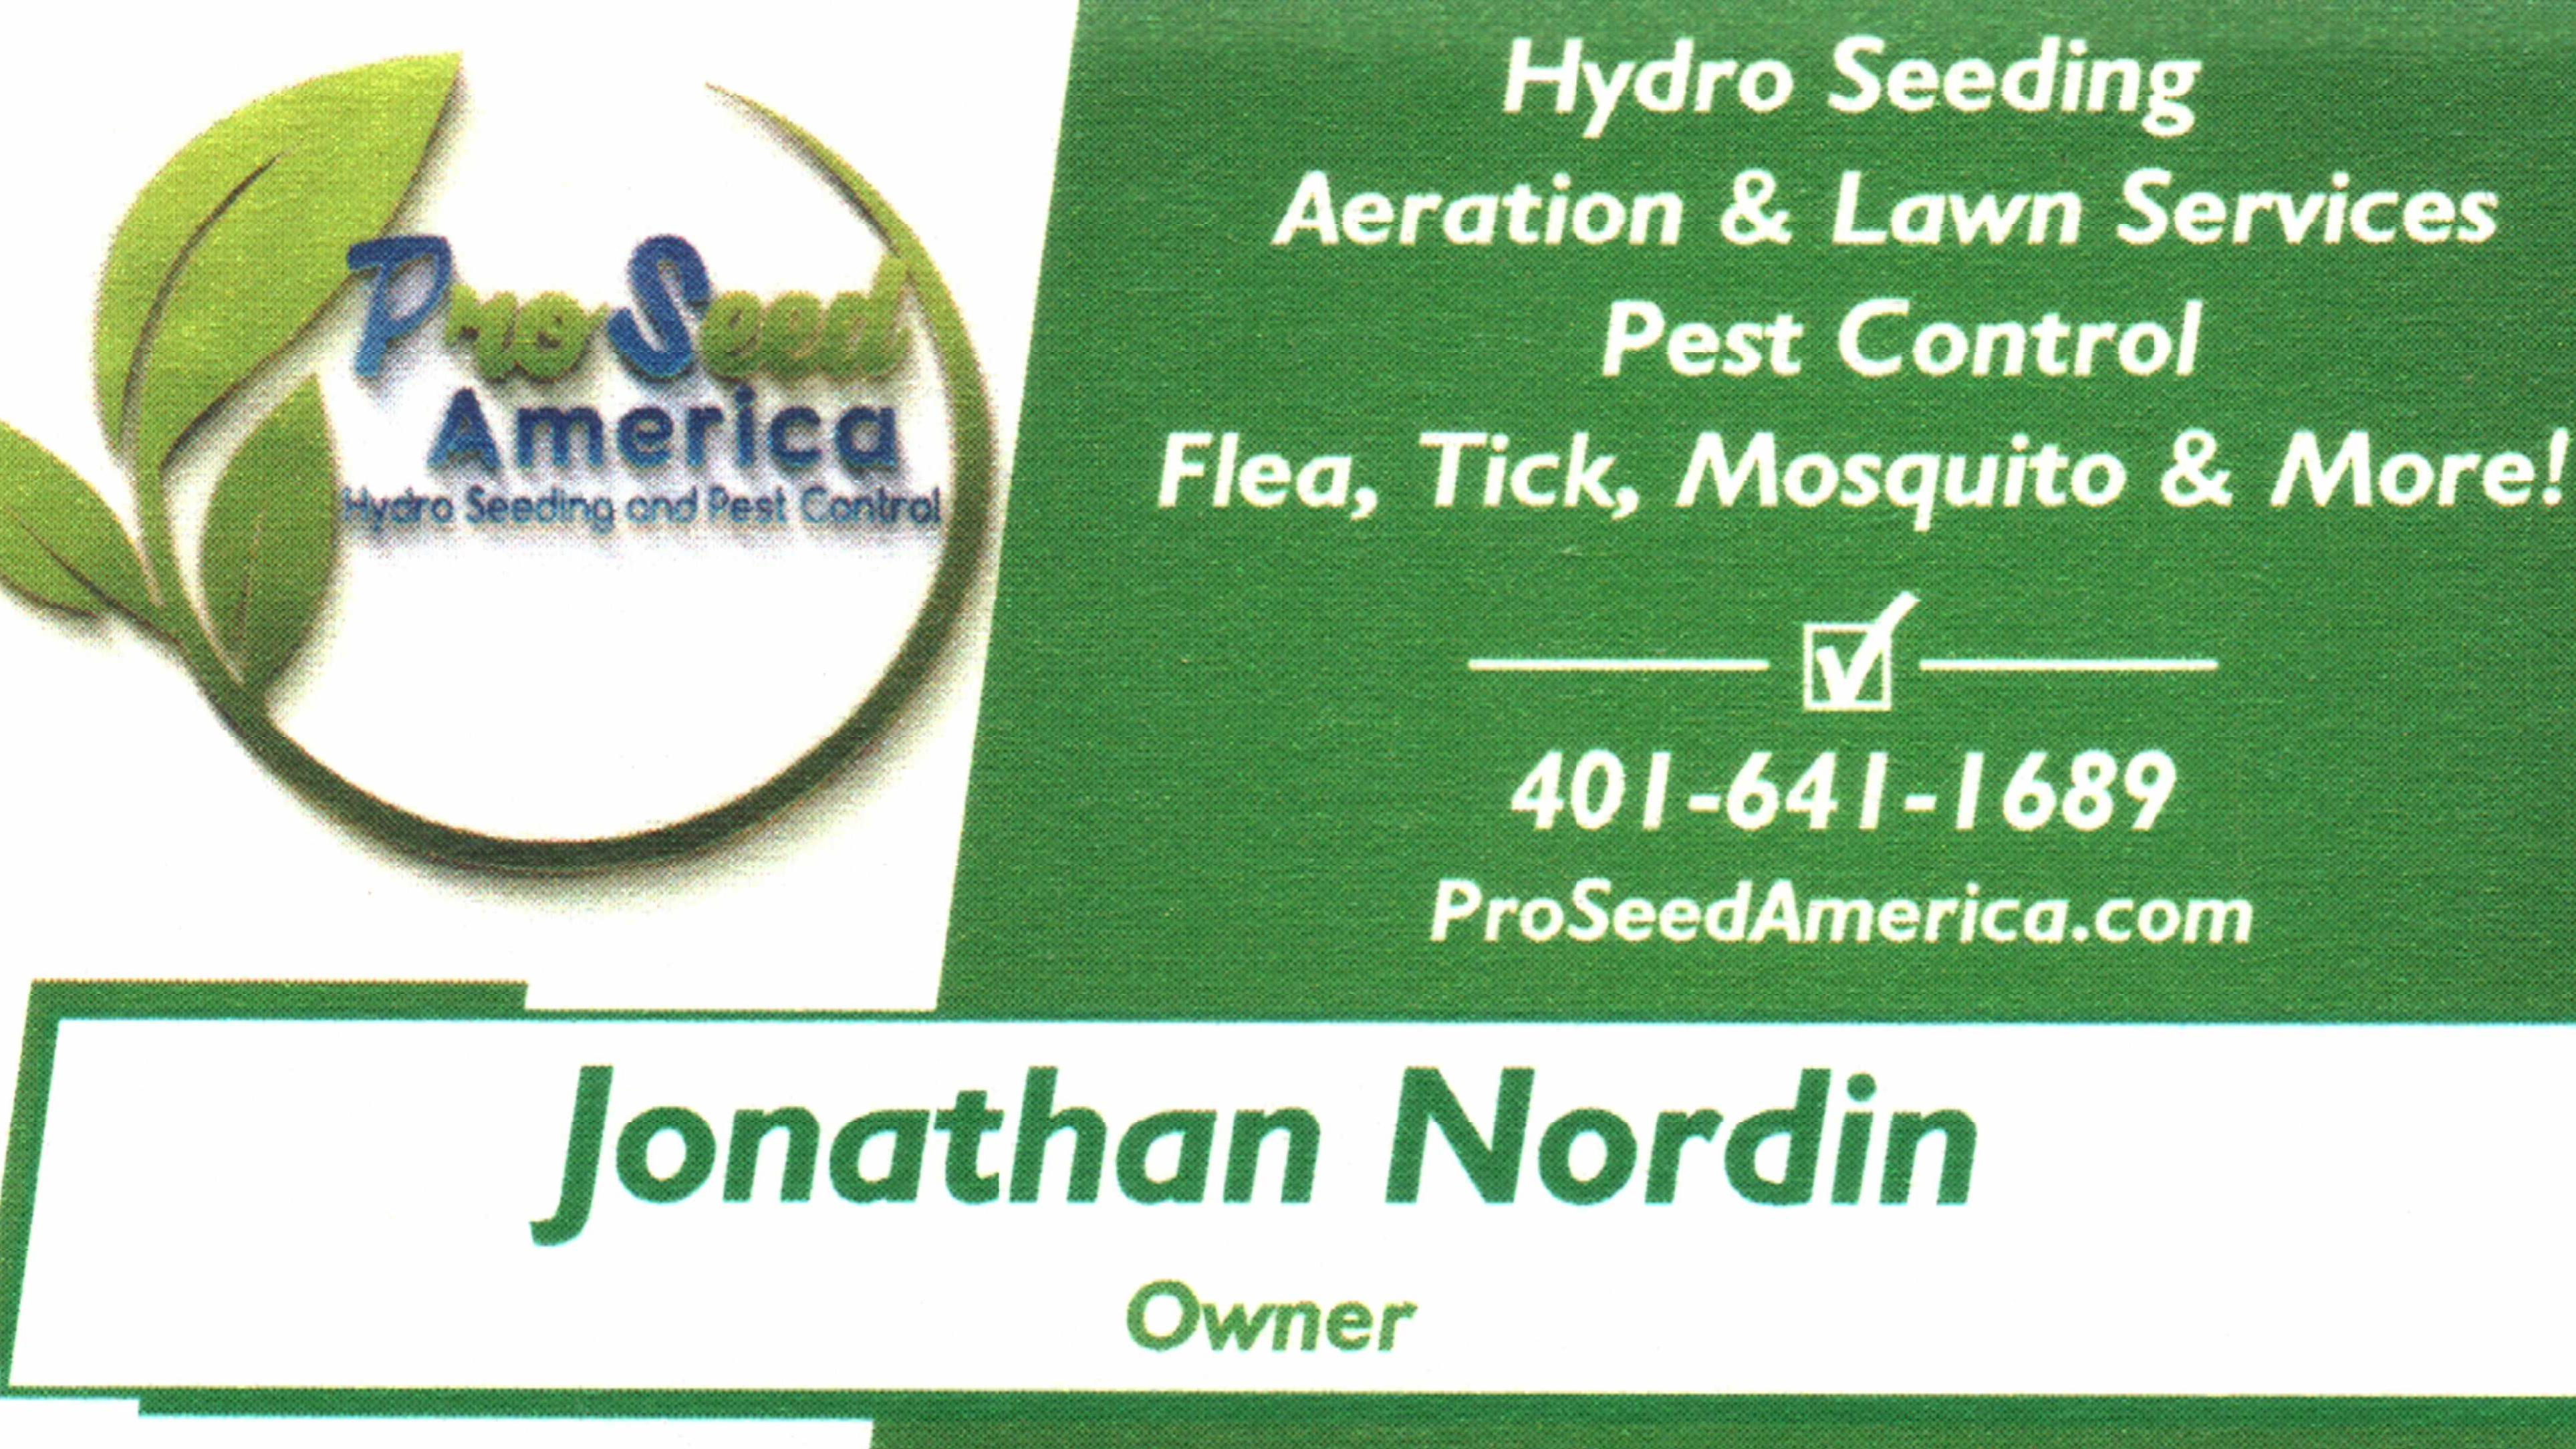 Pro Seed America